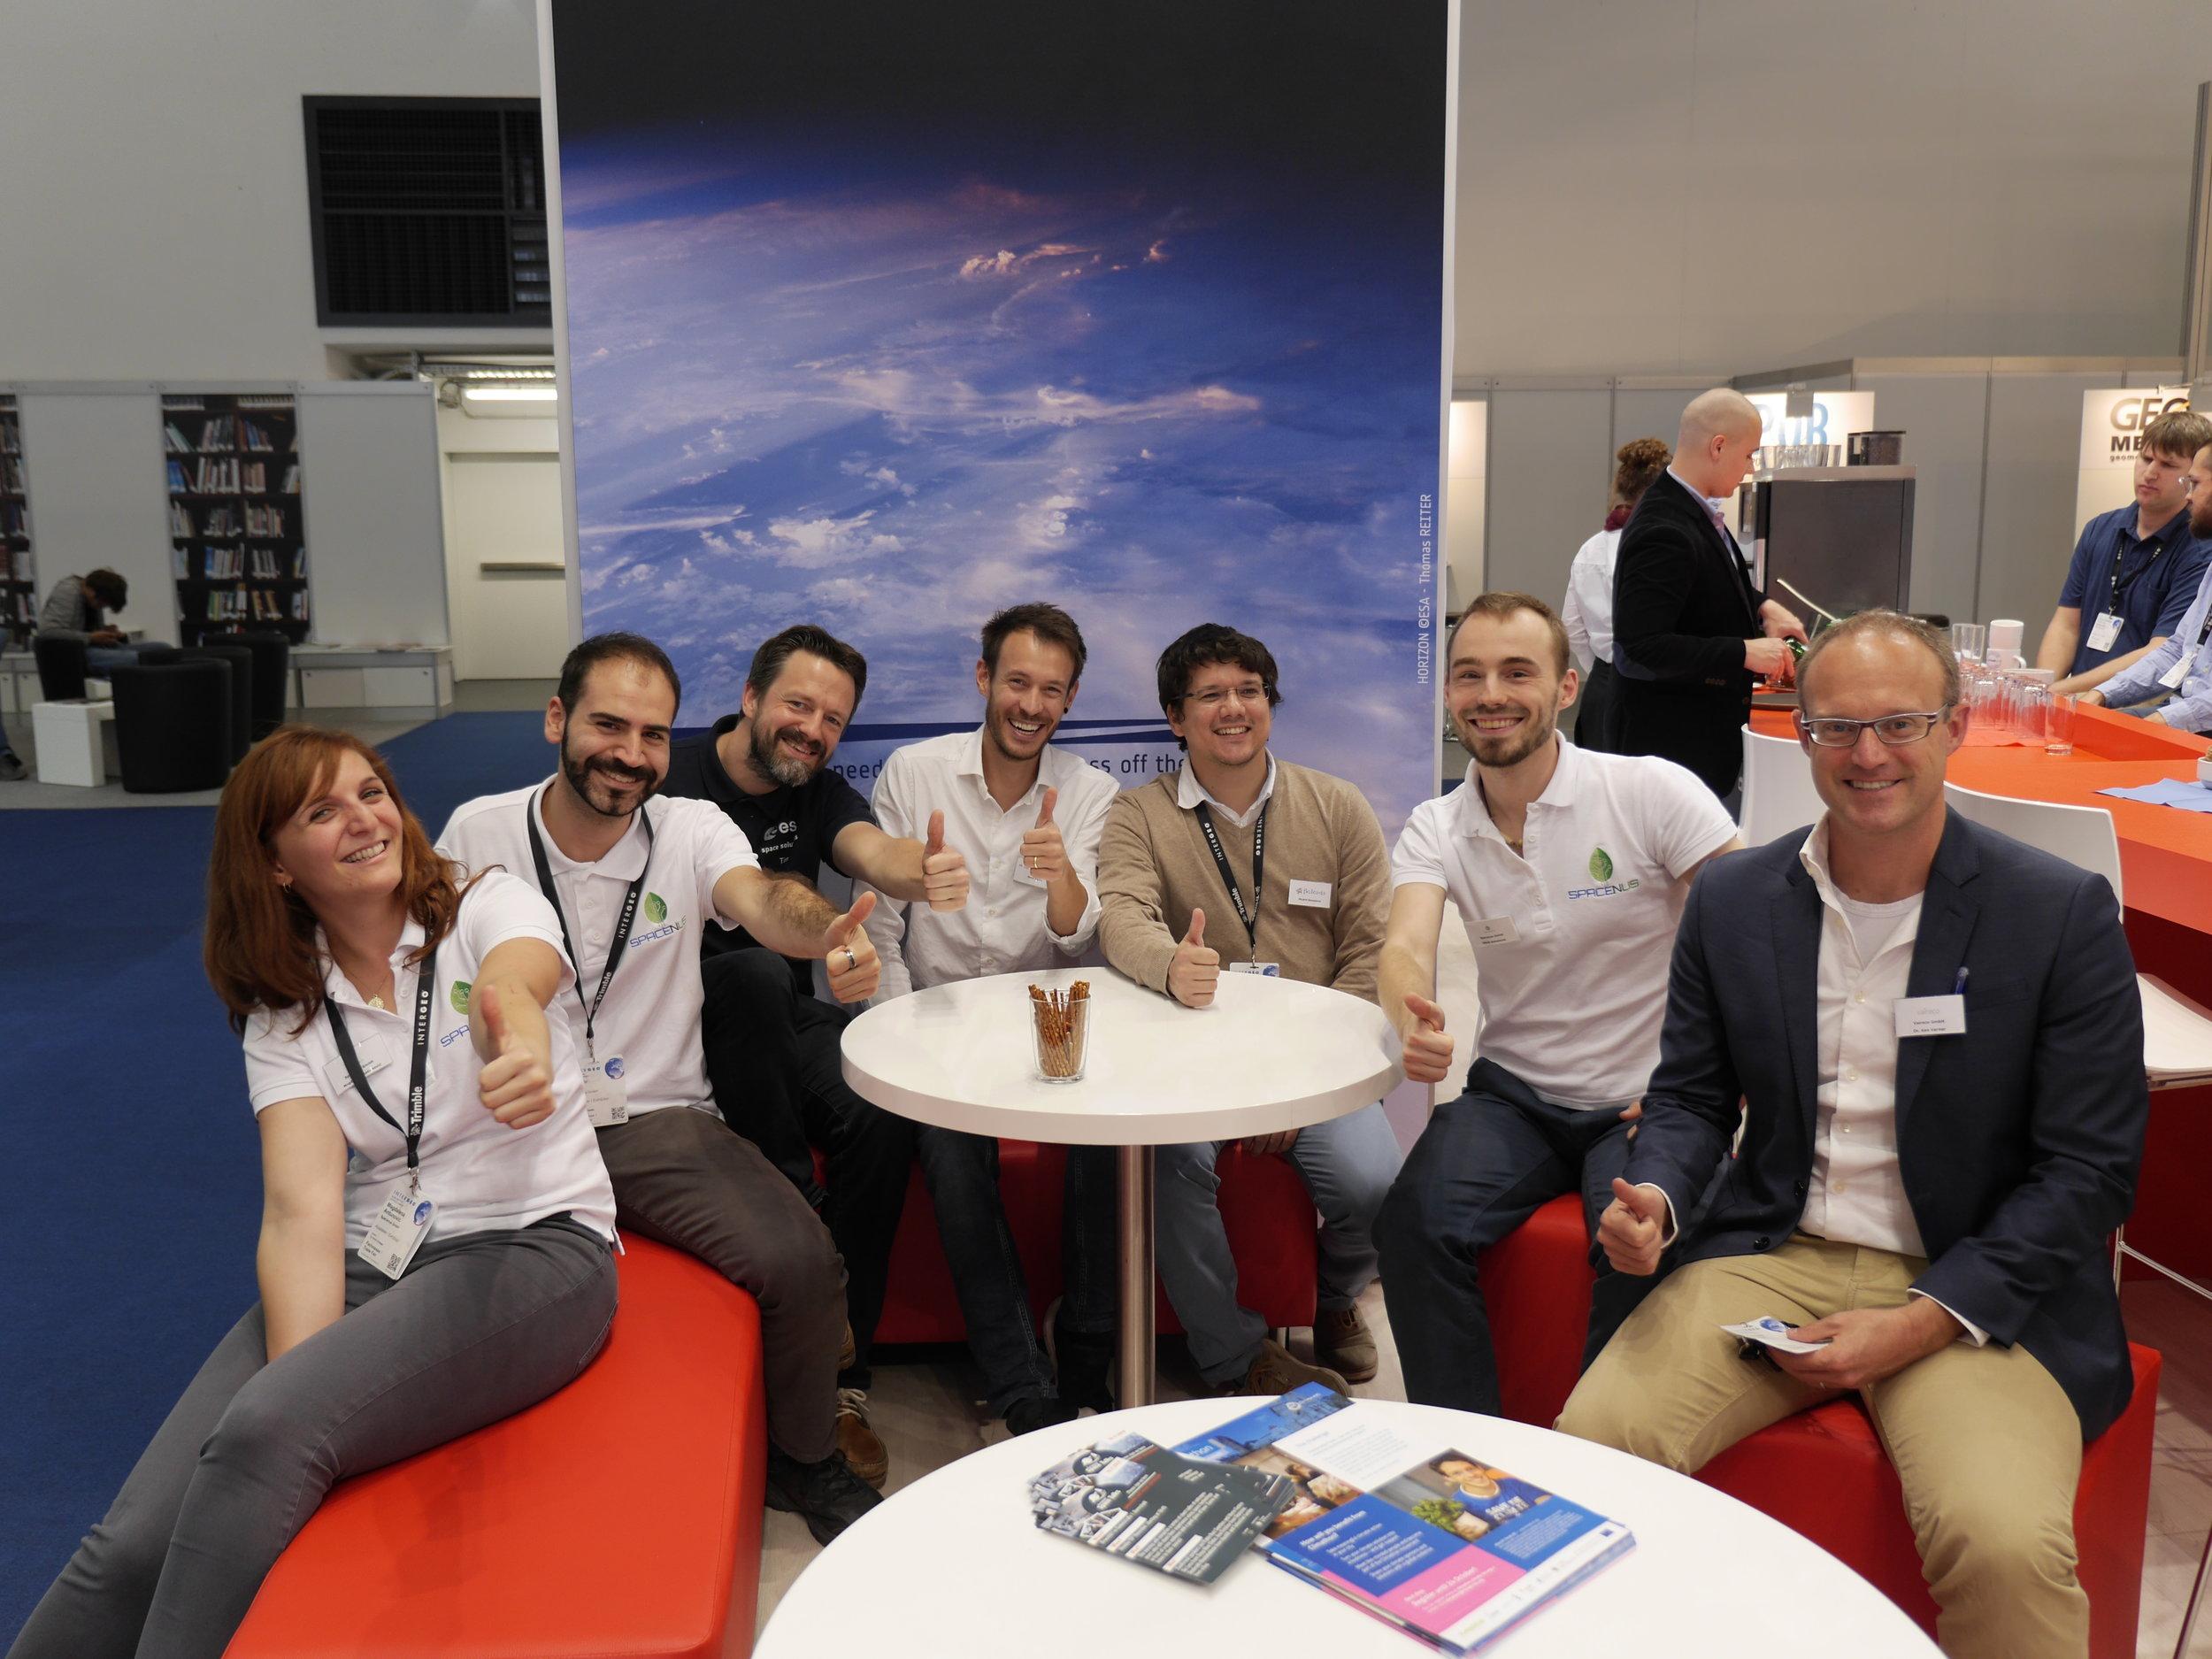 Spacenus together with cesah, Rokubun, Balamis and Vaireco (Photo source: cesah GmbH)